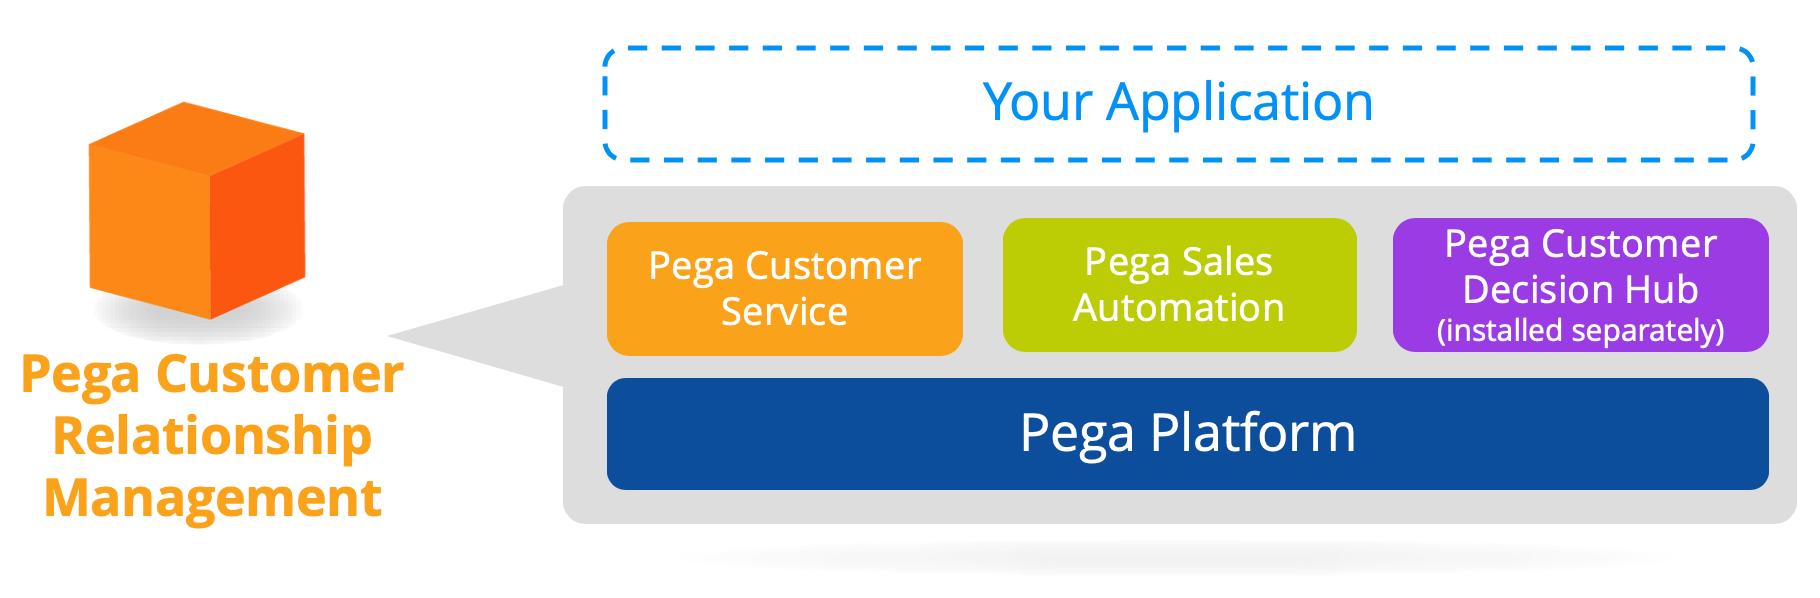 Pega Customer Relationship Management application stack